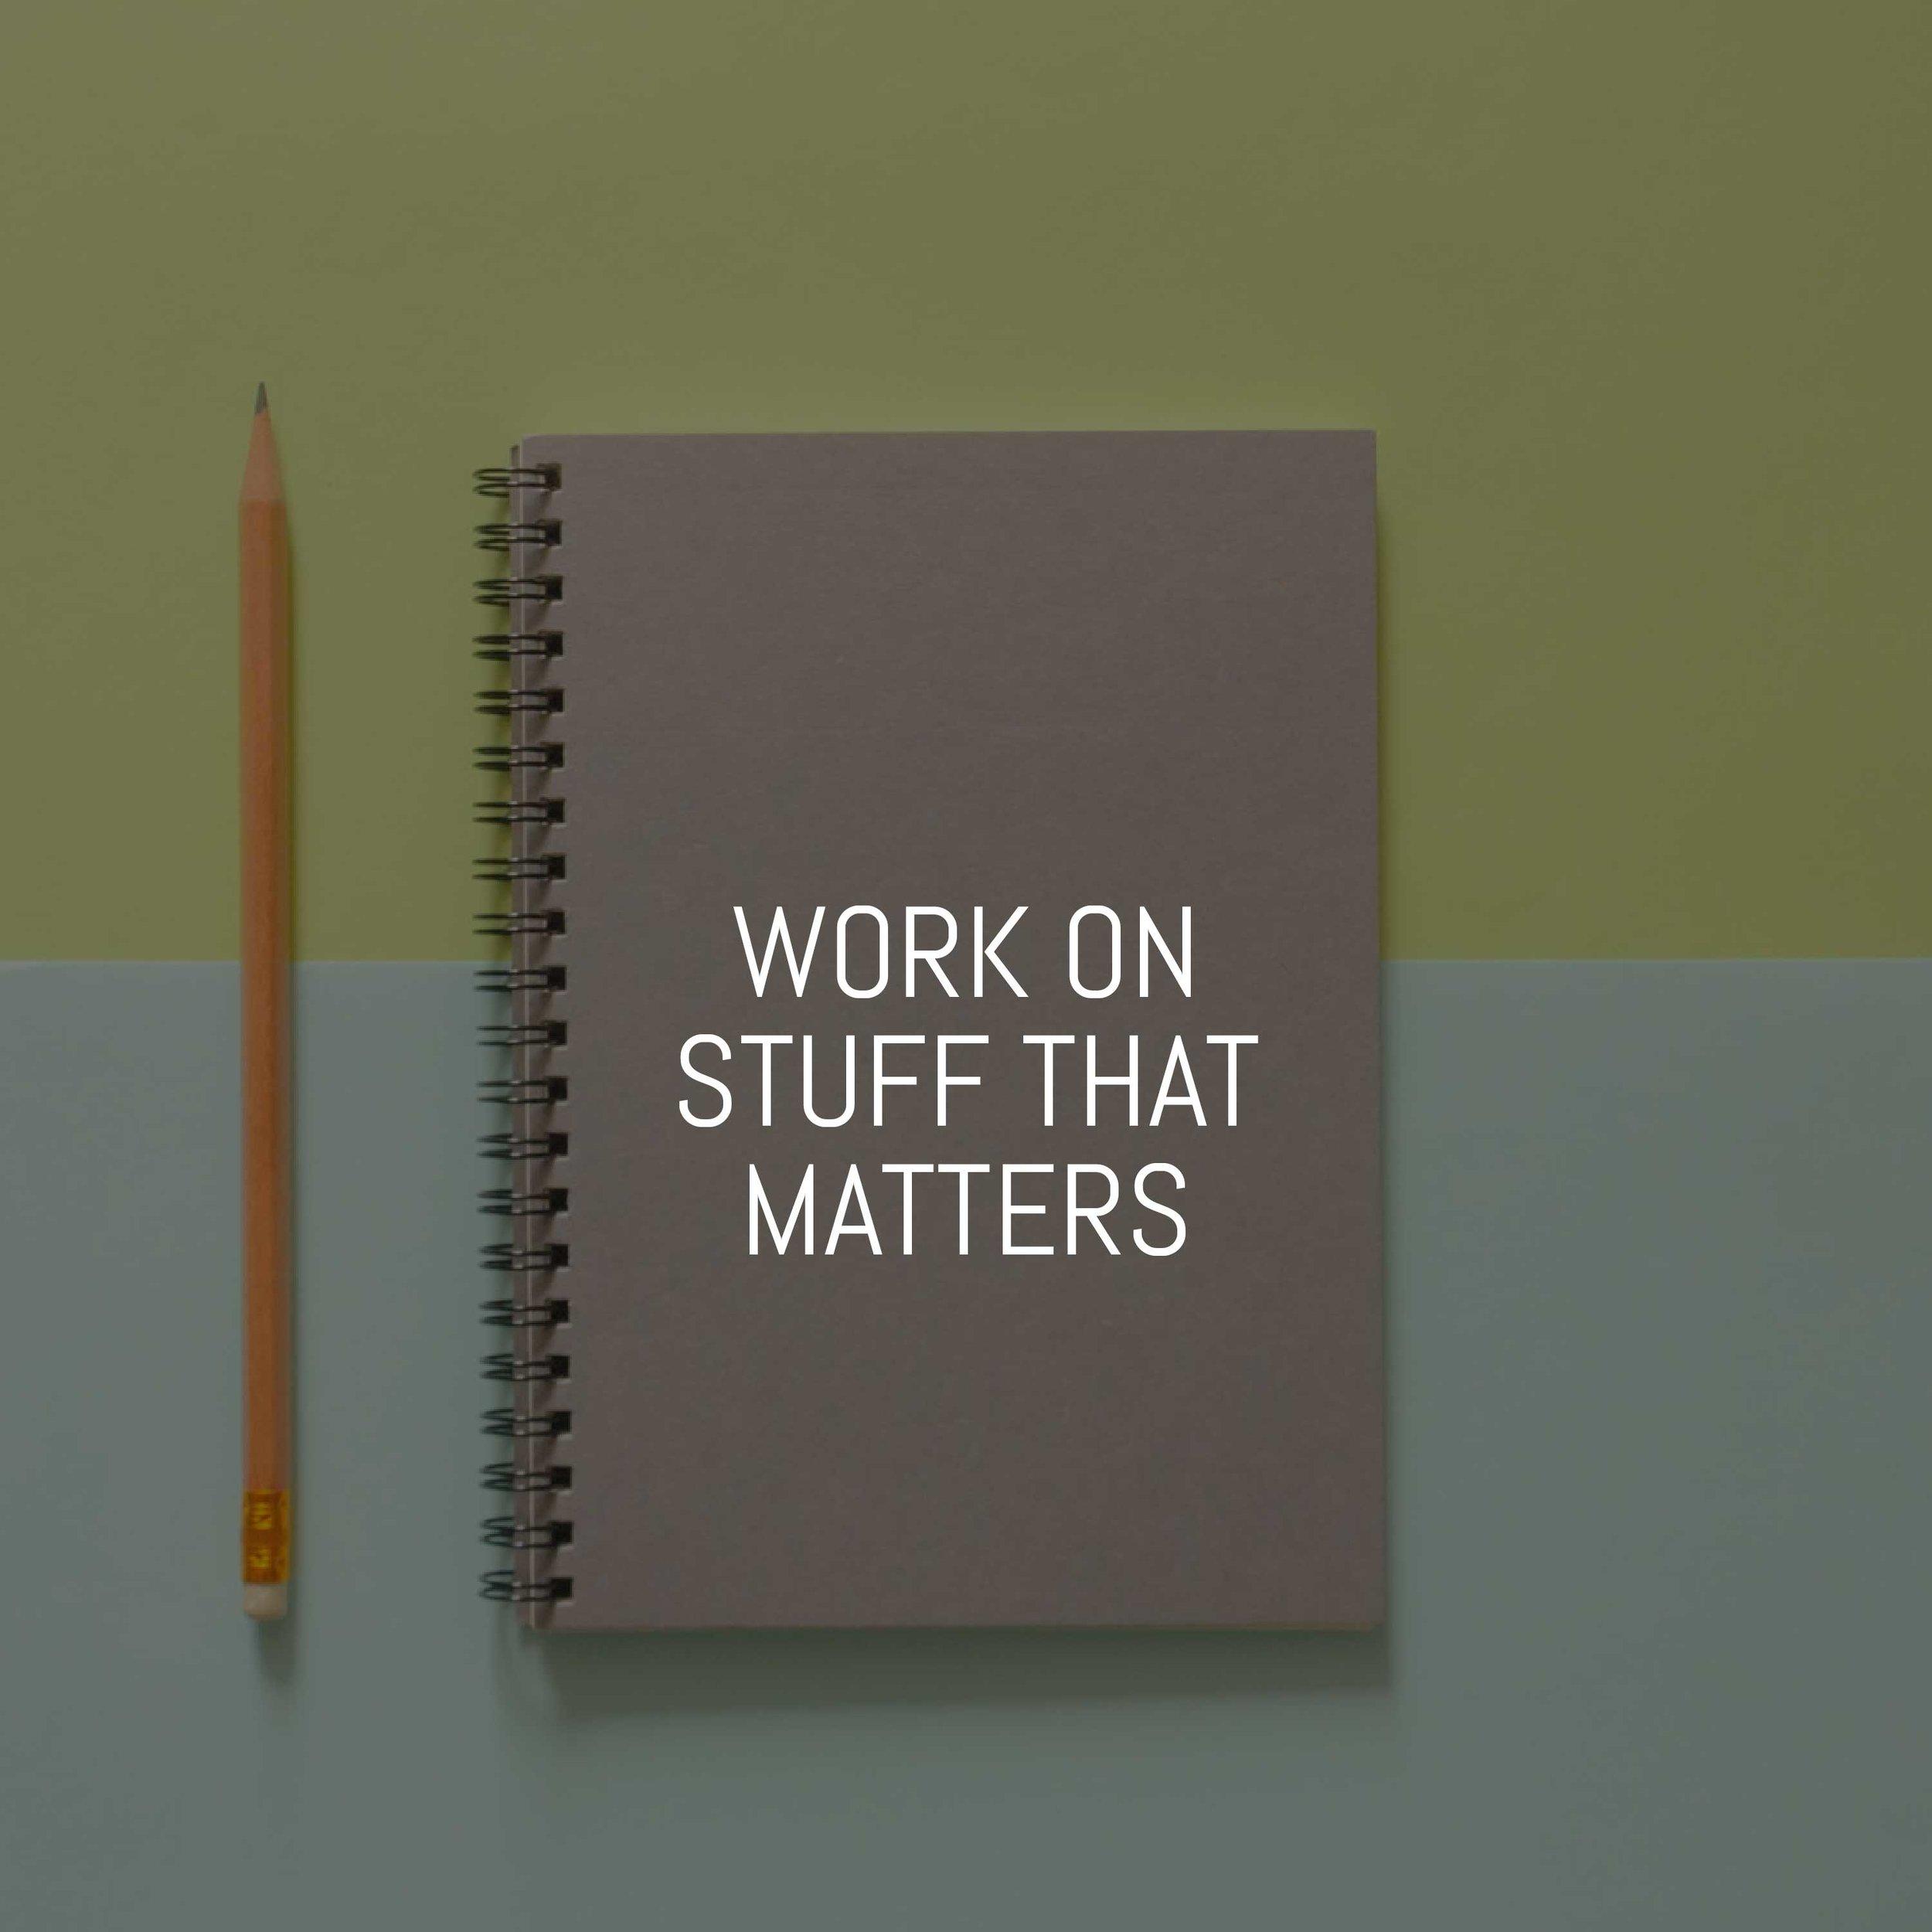 WORK-ON-STUFF-THAT-MATTERS-.jpg